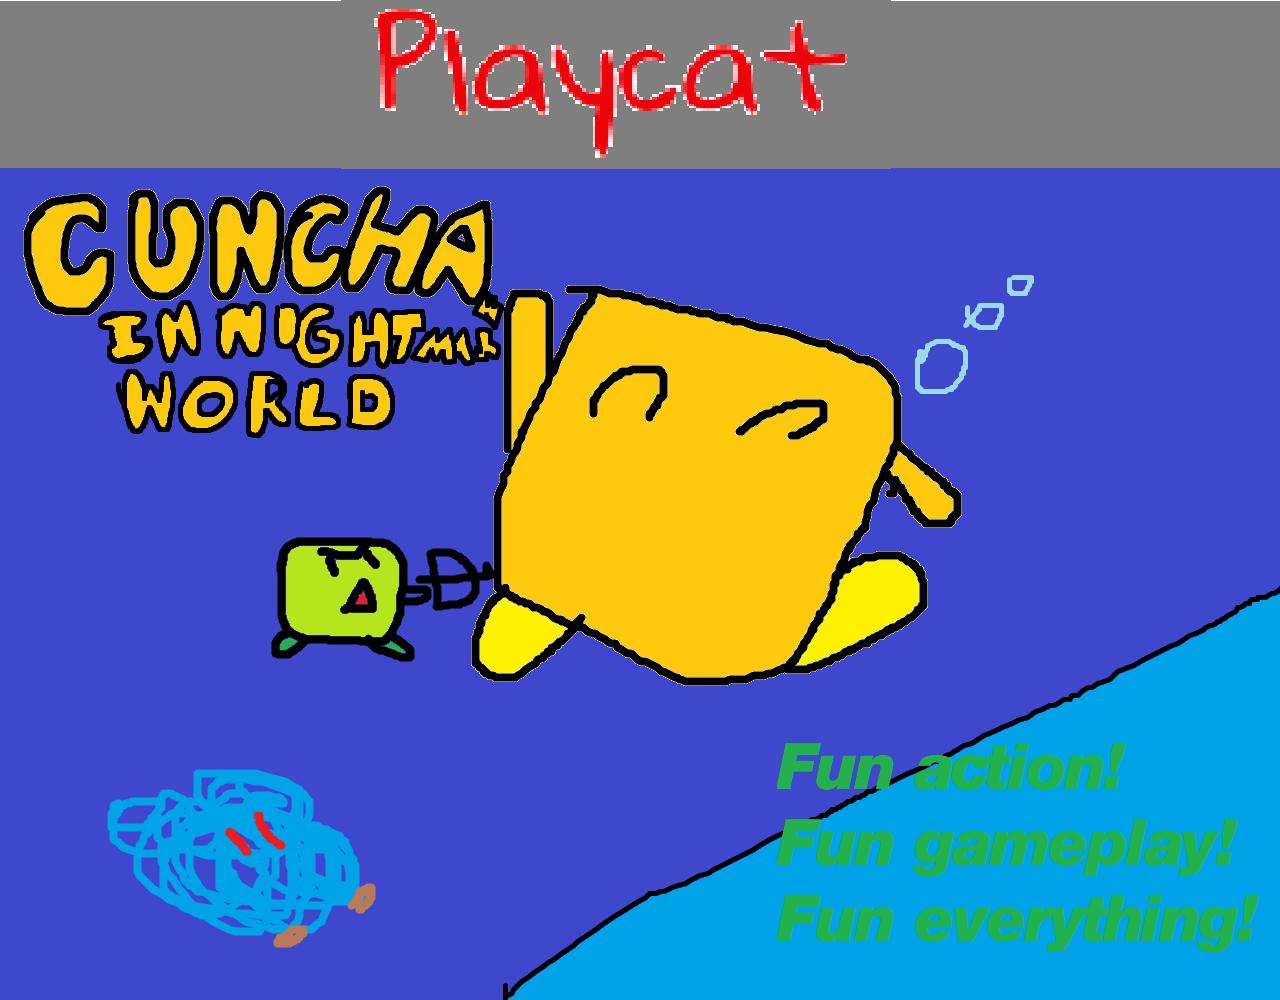 Cuncha in Nightmare World